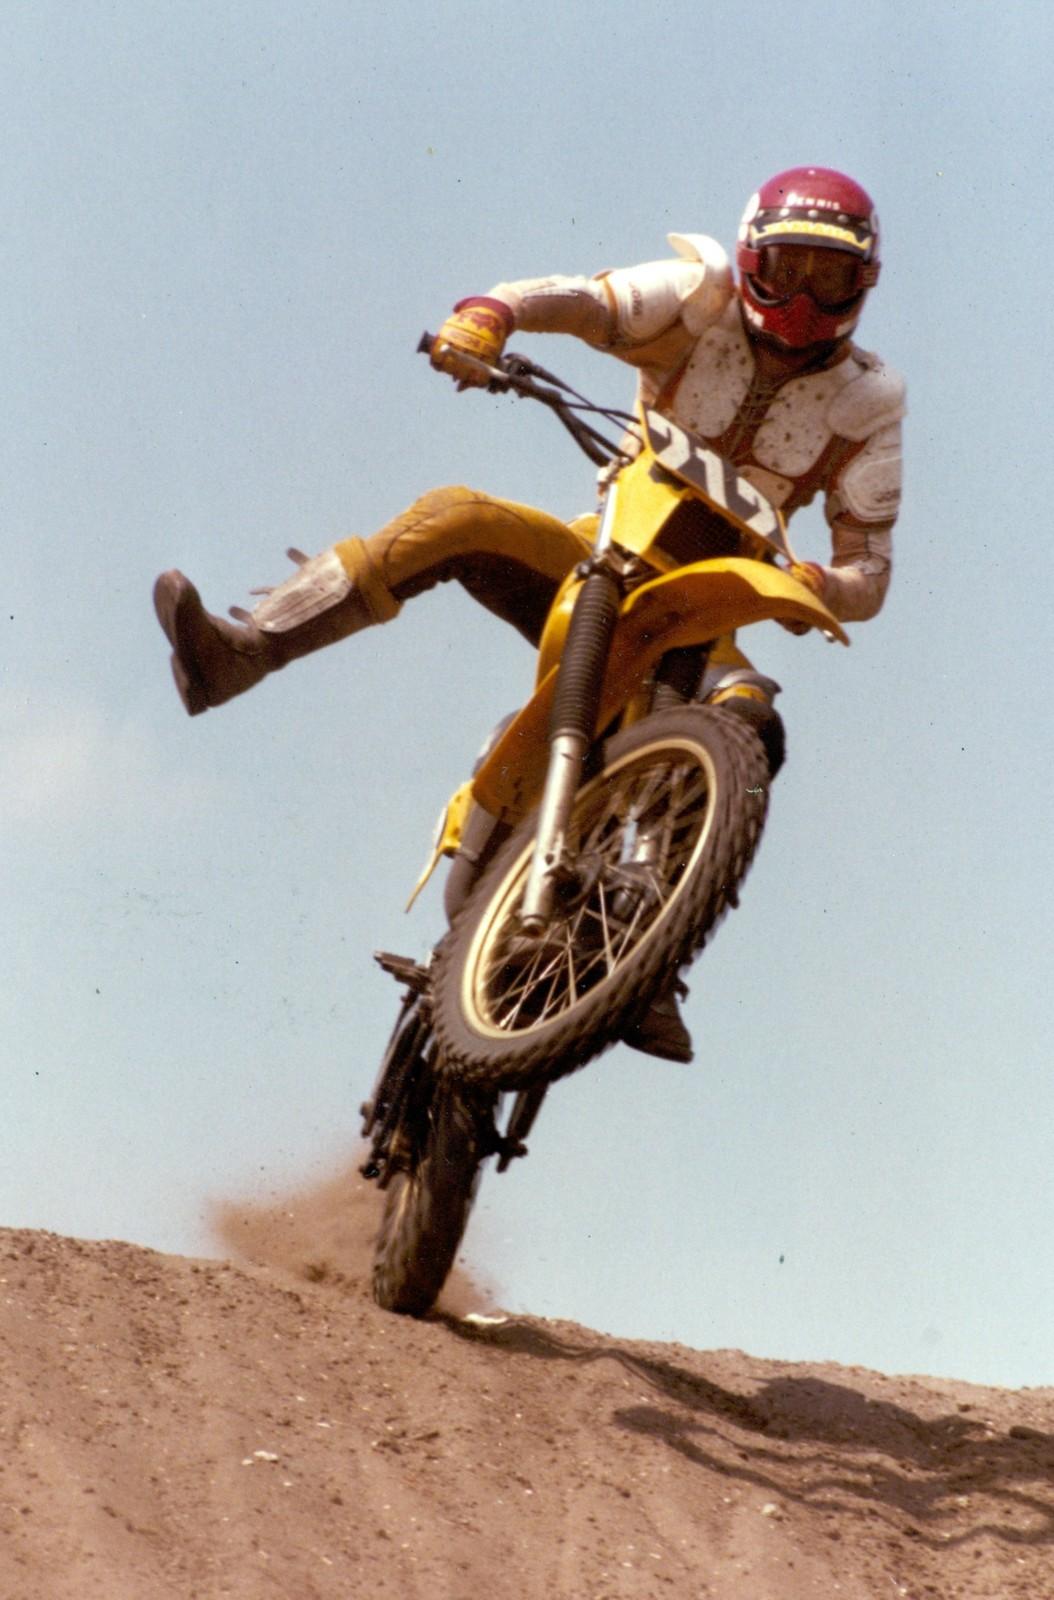 Goofing off during practice - BVS40FL - Motocross Pictures - Vital MX